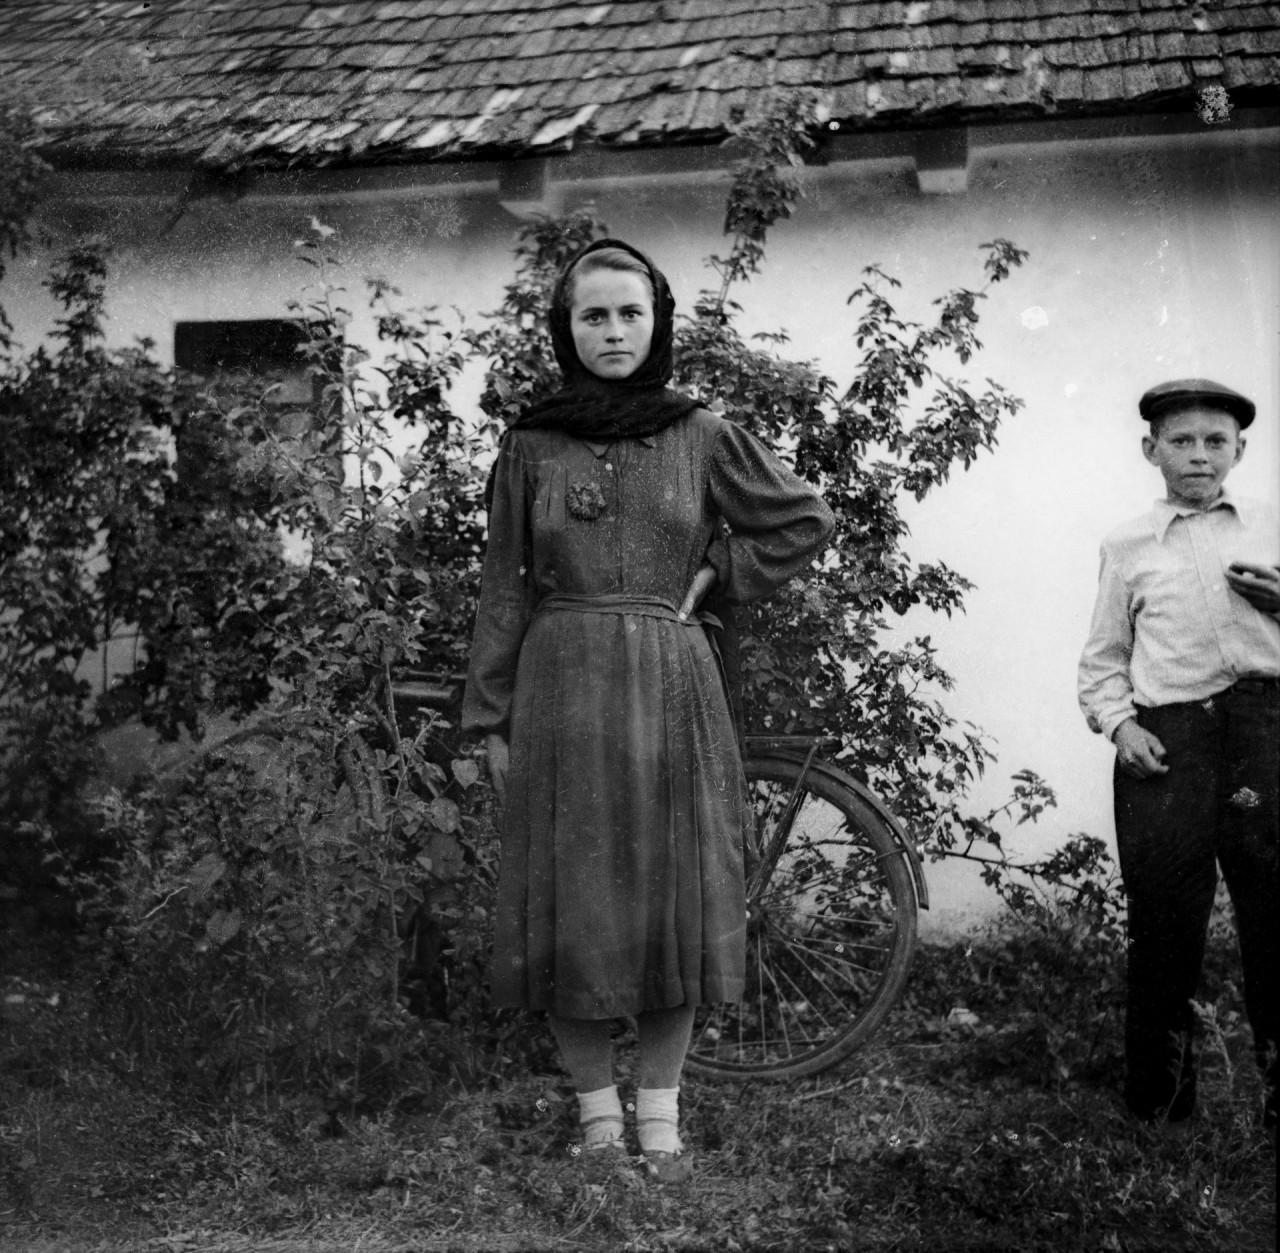 Архив сельского фотографа Захарии Кушнира (19)